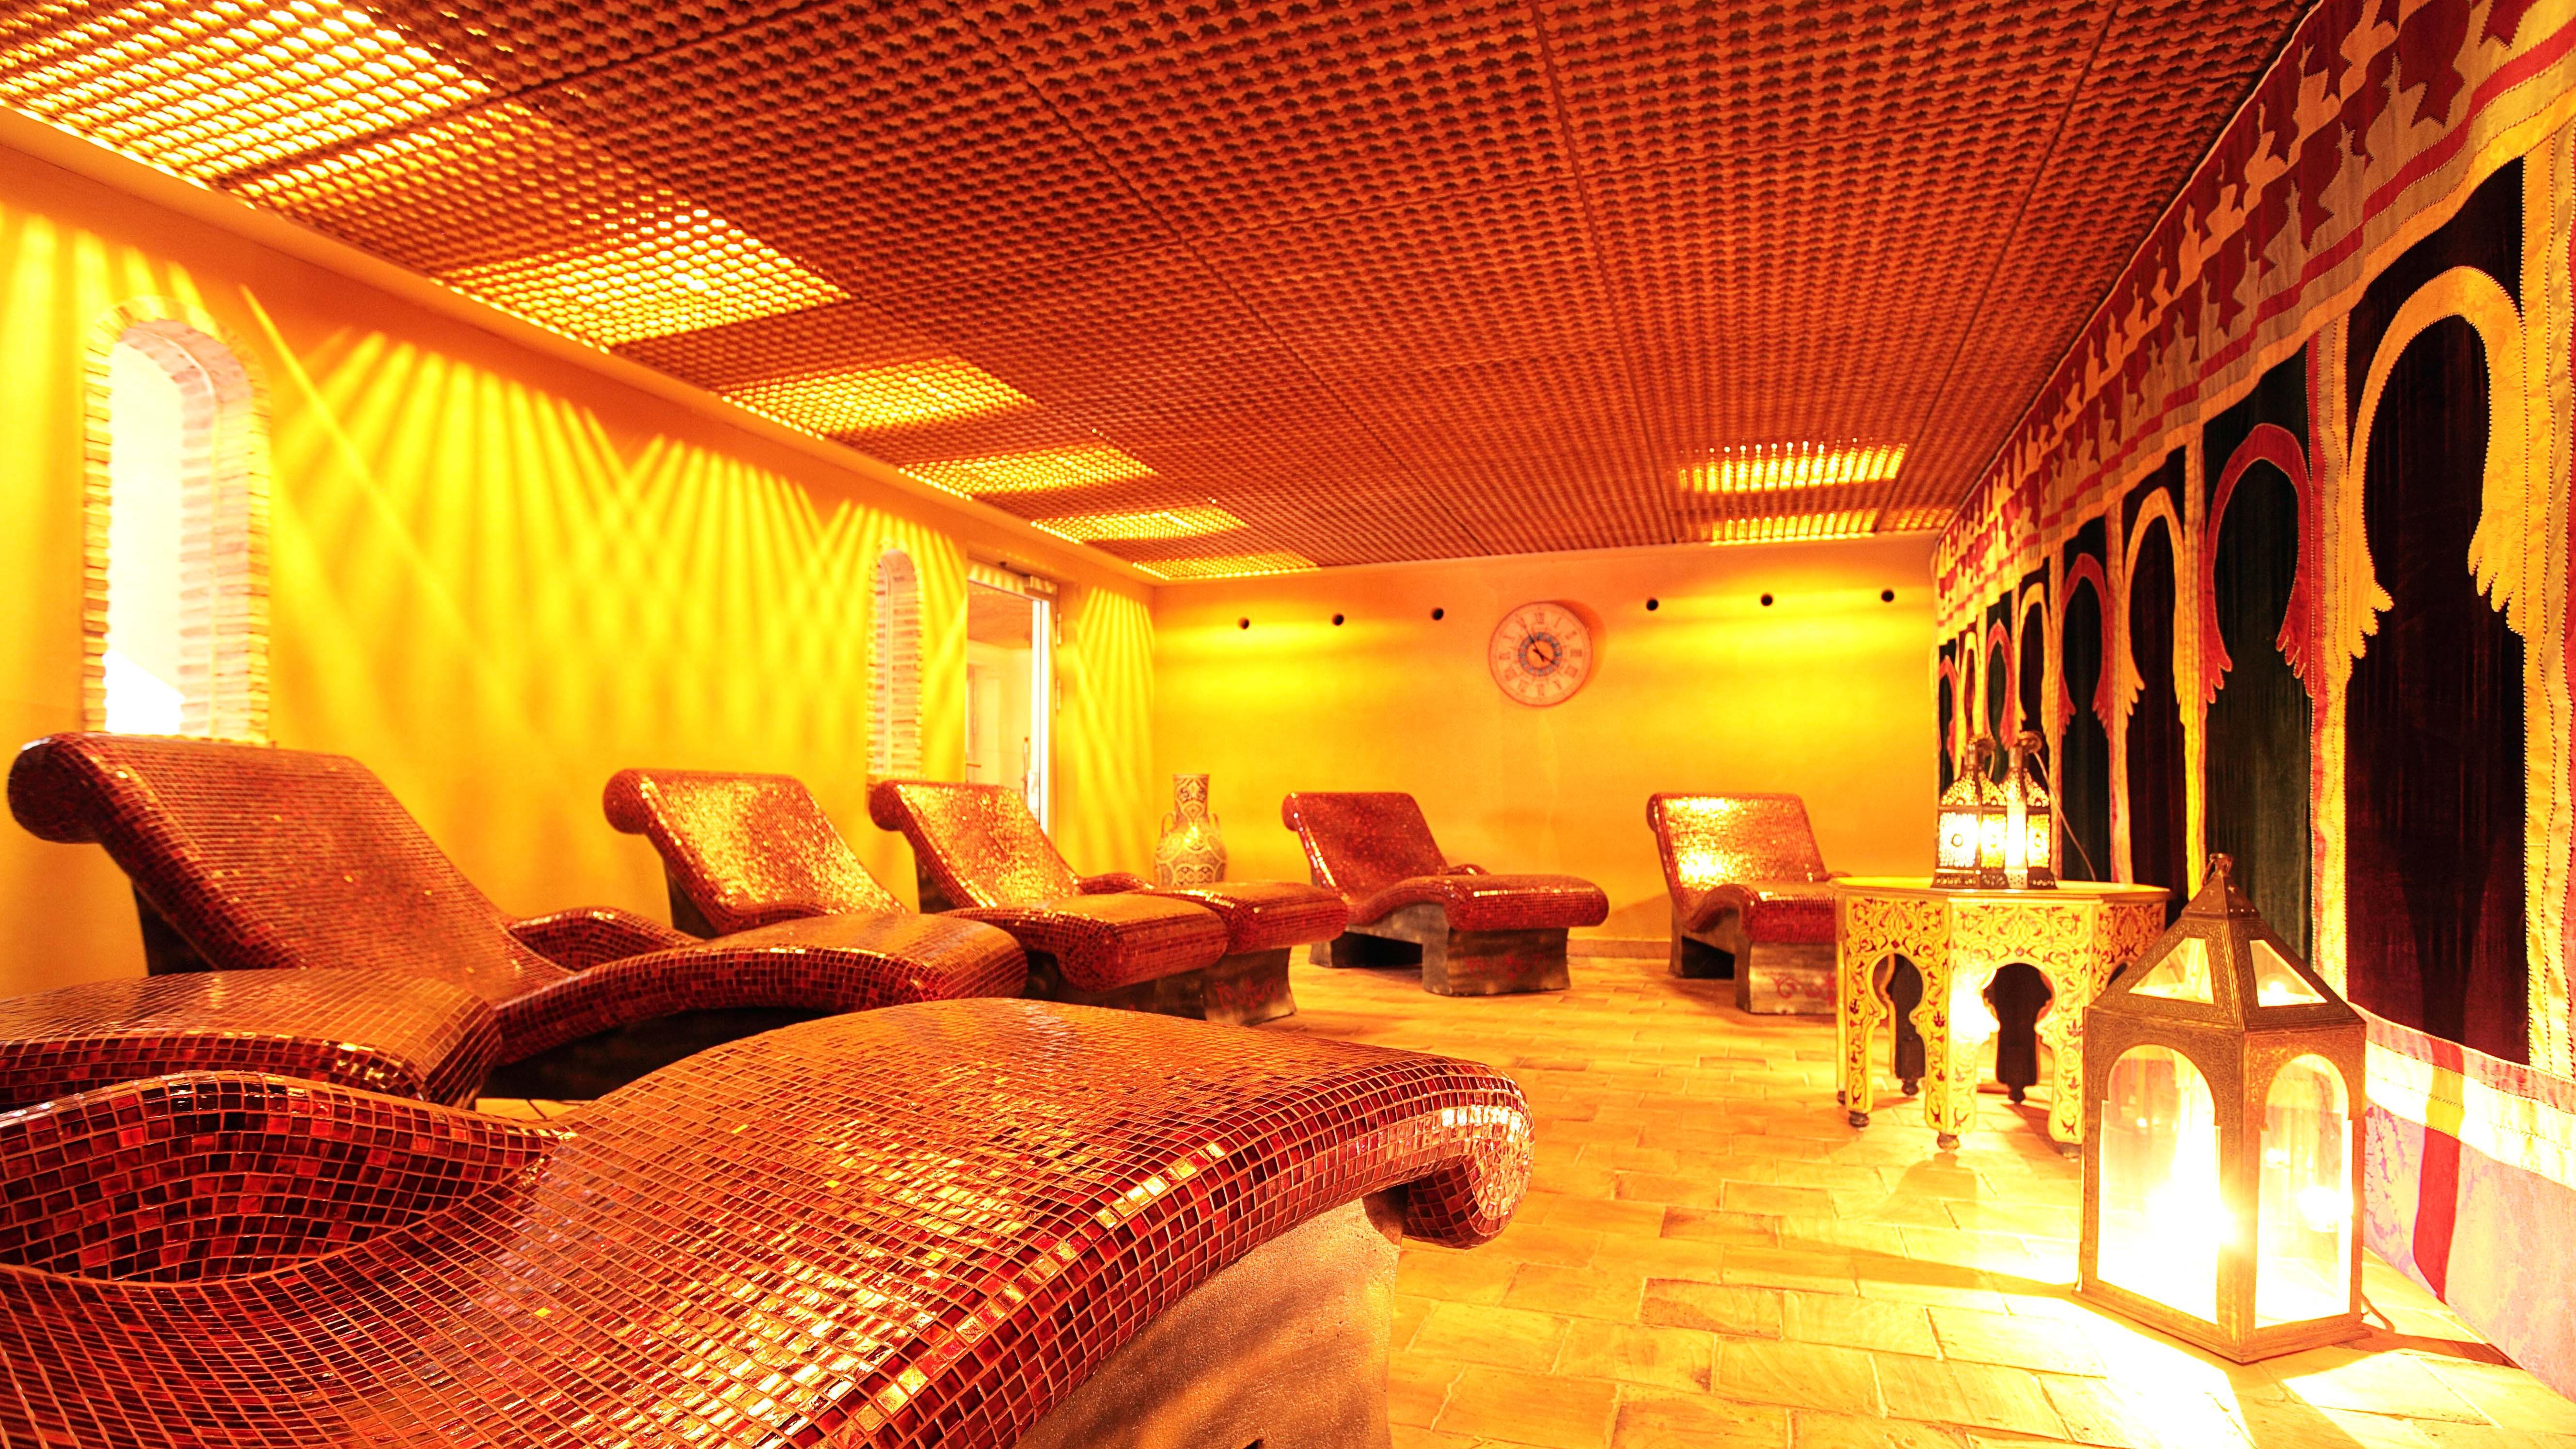 ruheraum marakkesch wellness wernau. Black Bedroom Furniture Sets. Home Design Ideas